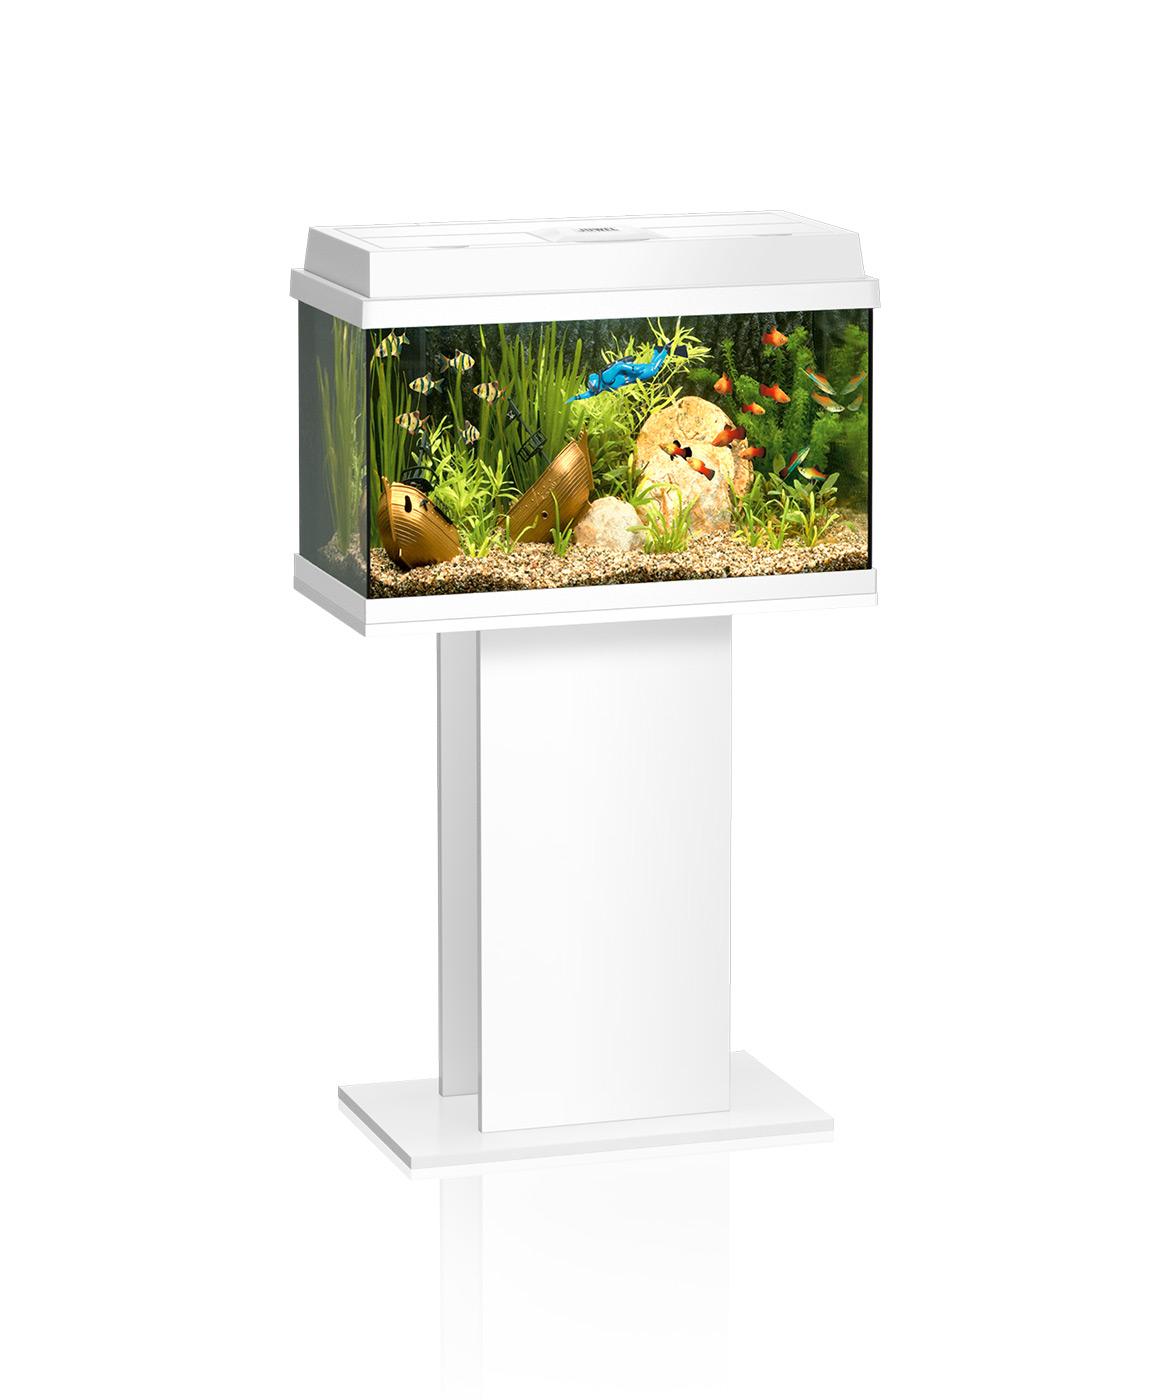 juwel primo 60 l e d aquarium and stand. Black Bedroom Furniture Sets. Home Design Ideas